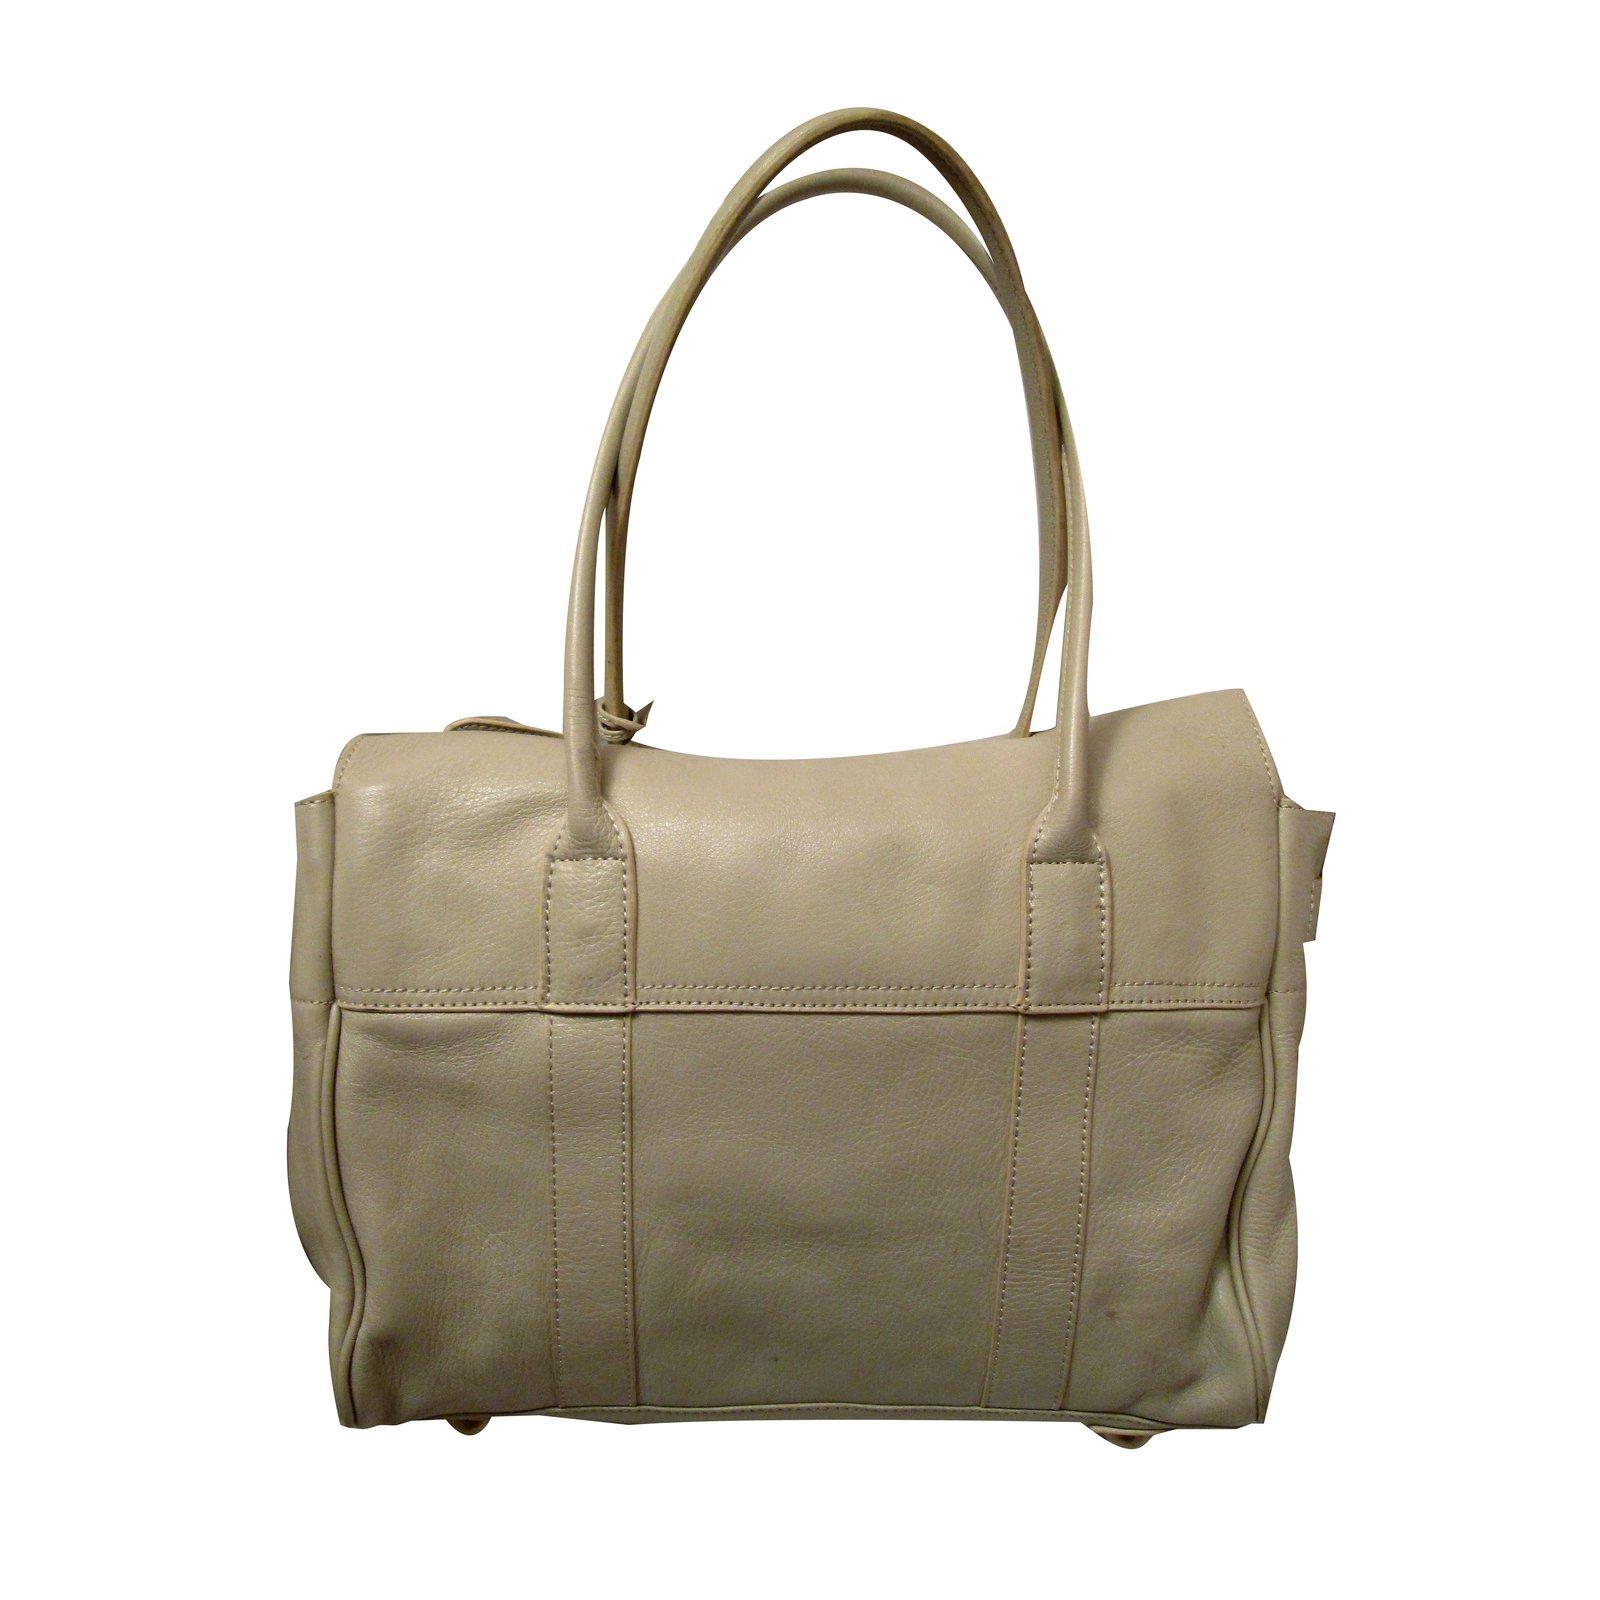 48b4d079fed ... discount code for mulberry handbags handbags leather beige ref.59476  joli closet 316c4 072dd